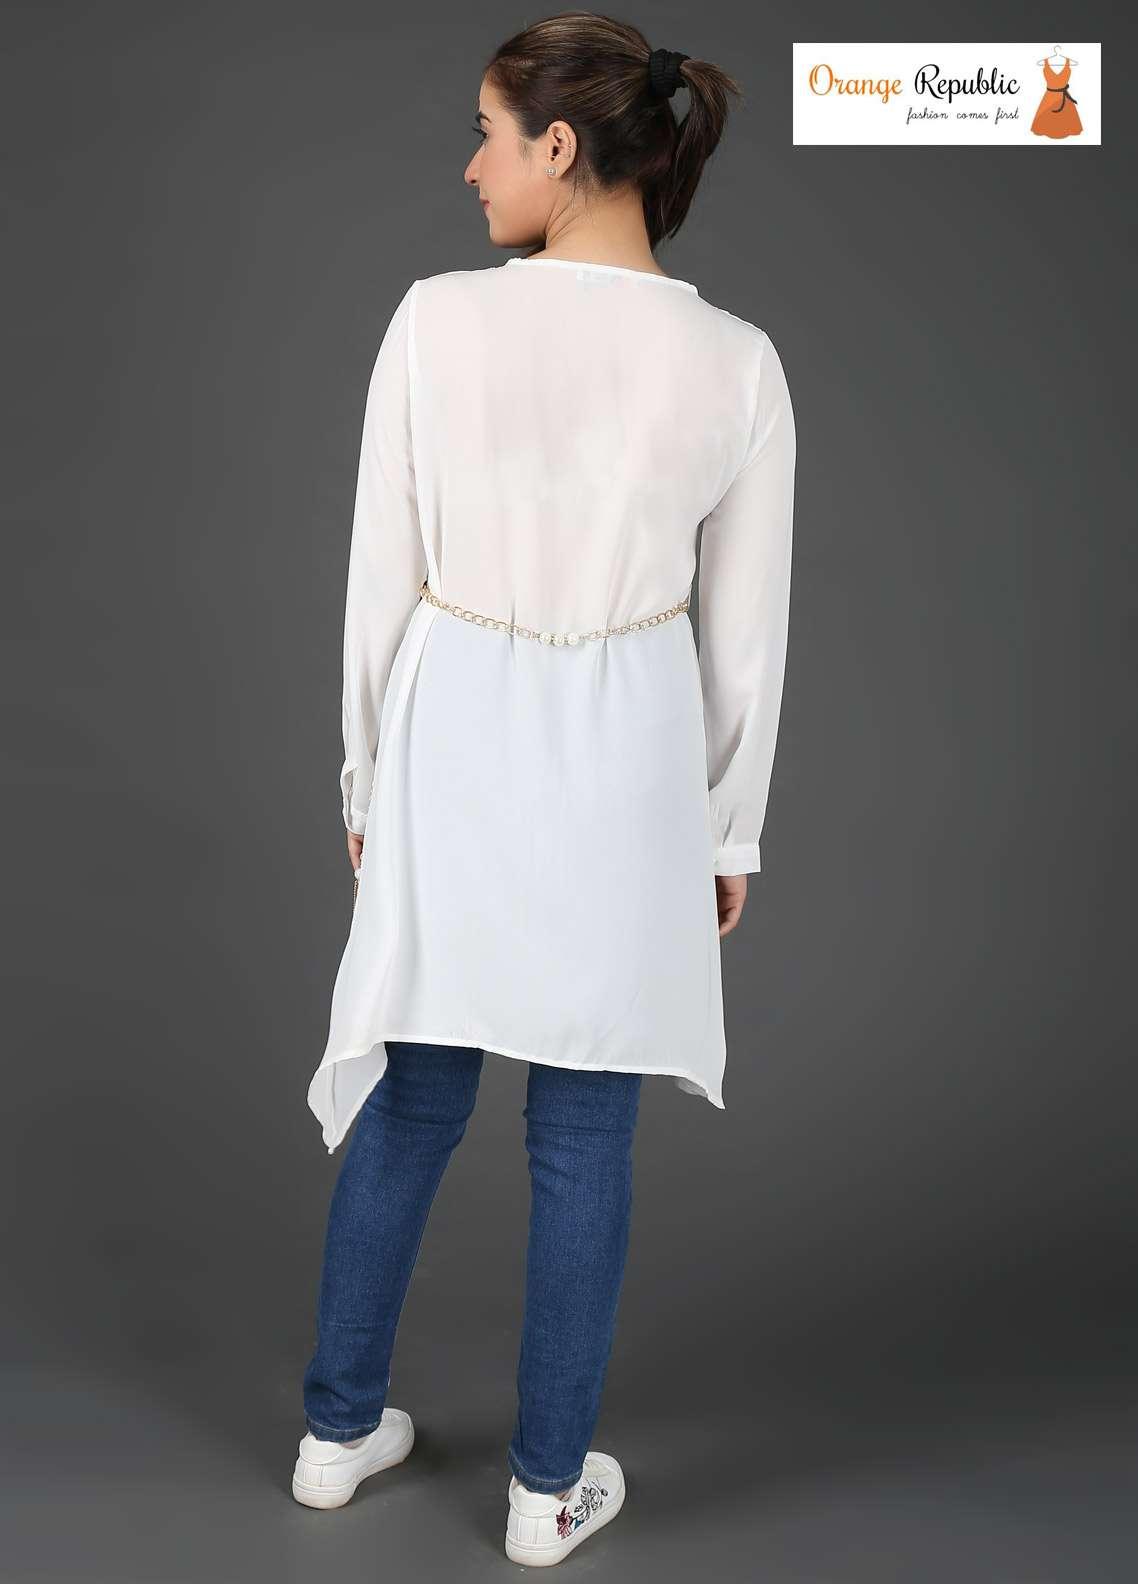 Orange Republic Fancy Style Bubble Chiffon Stitched Tops USA-09 White & Blue